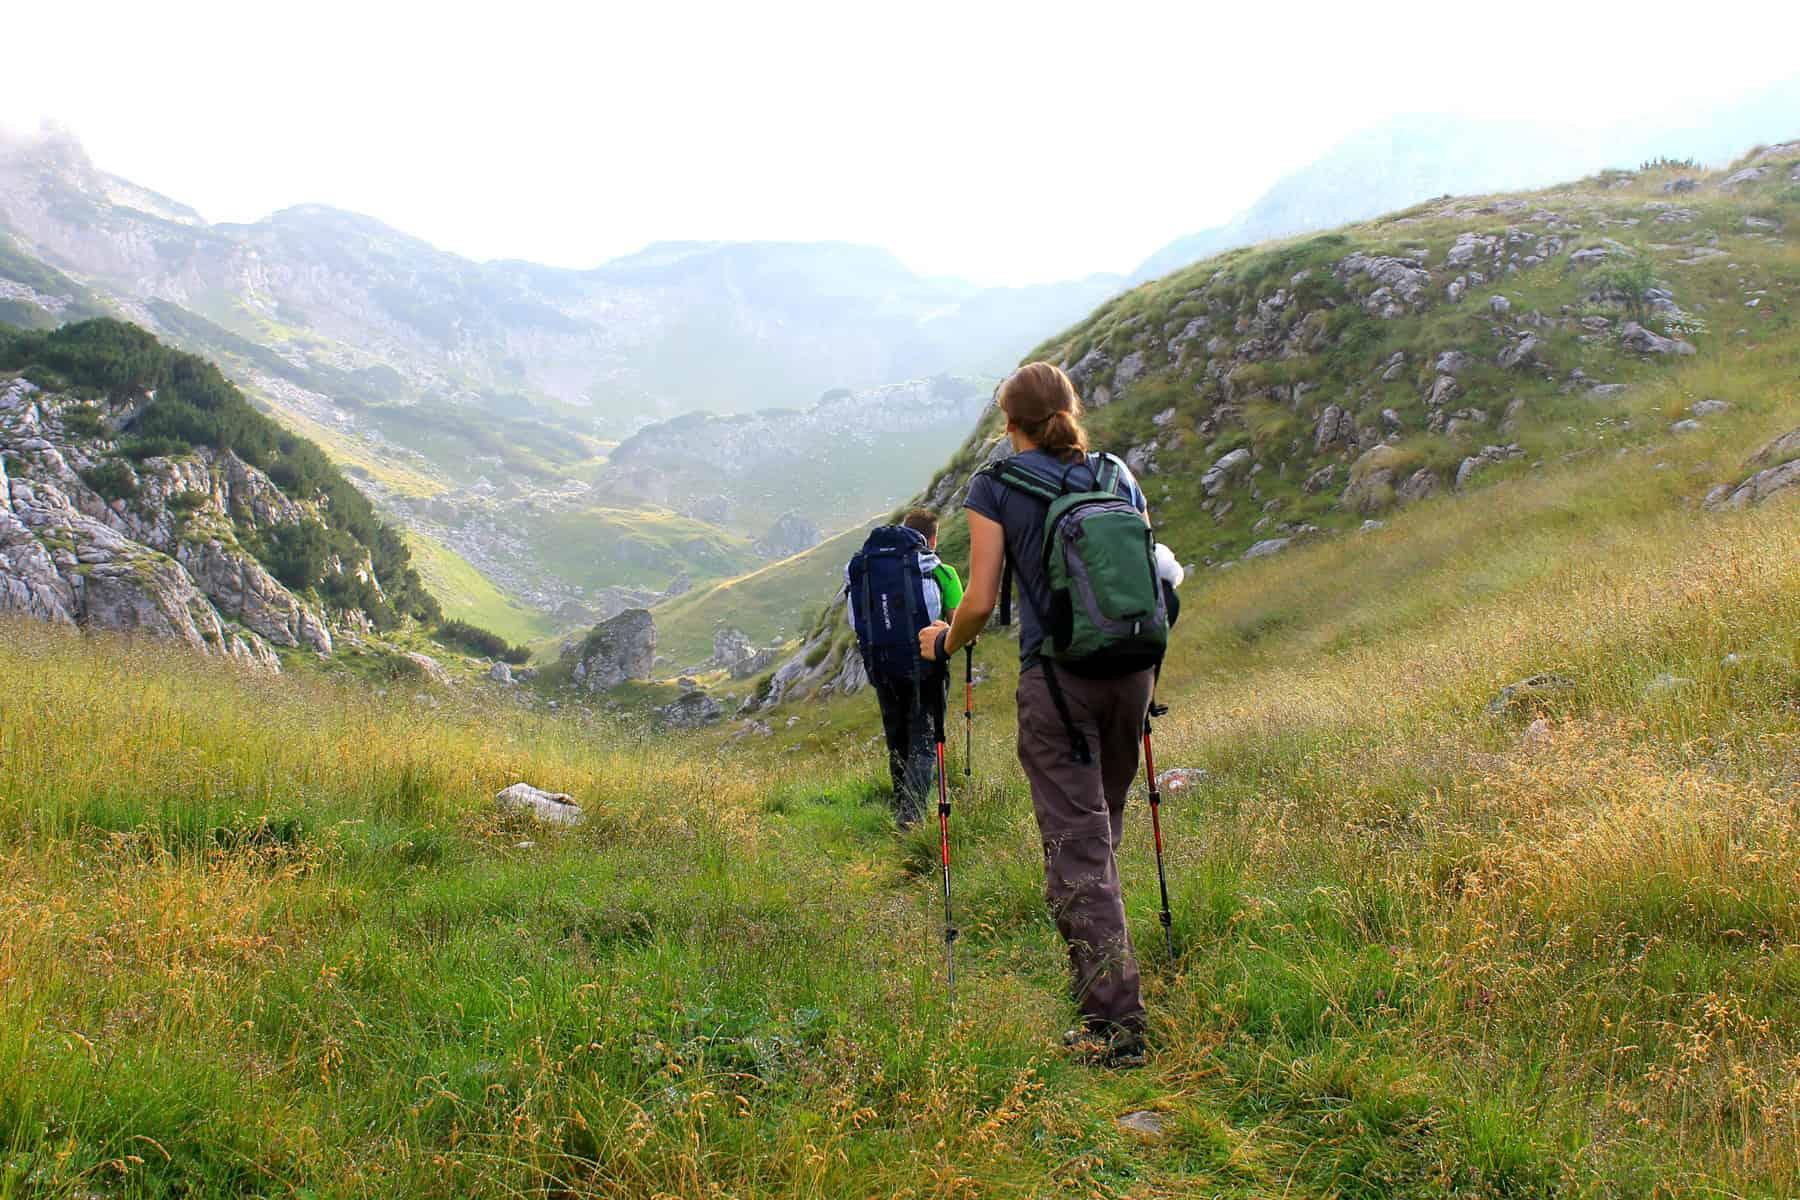 Hiking on Durmitor